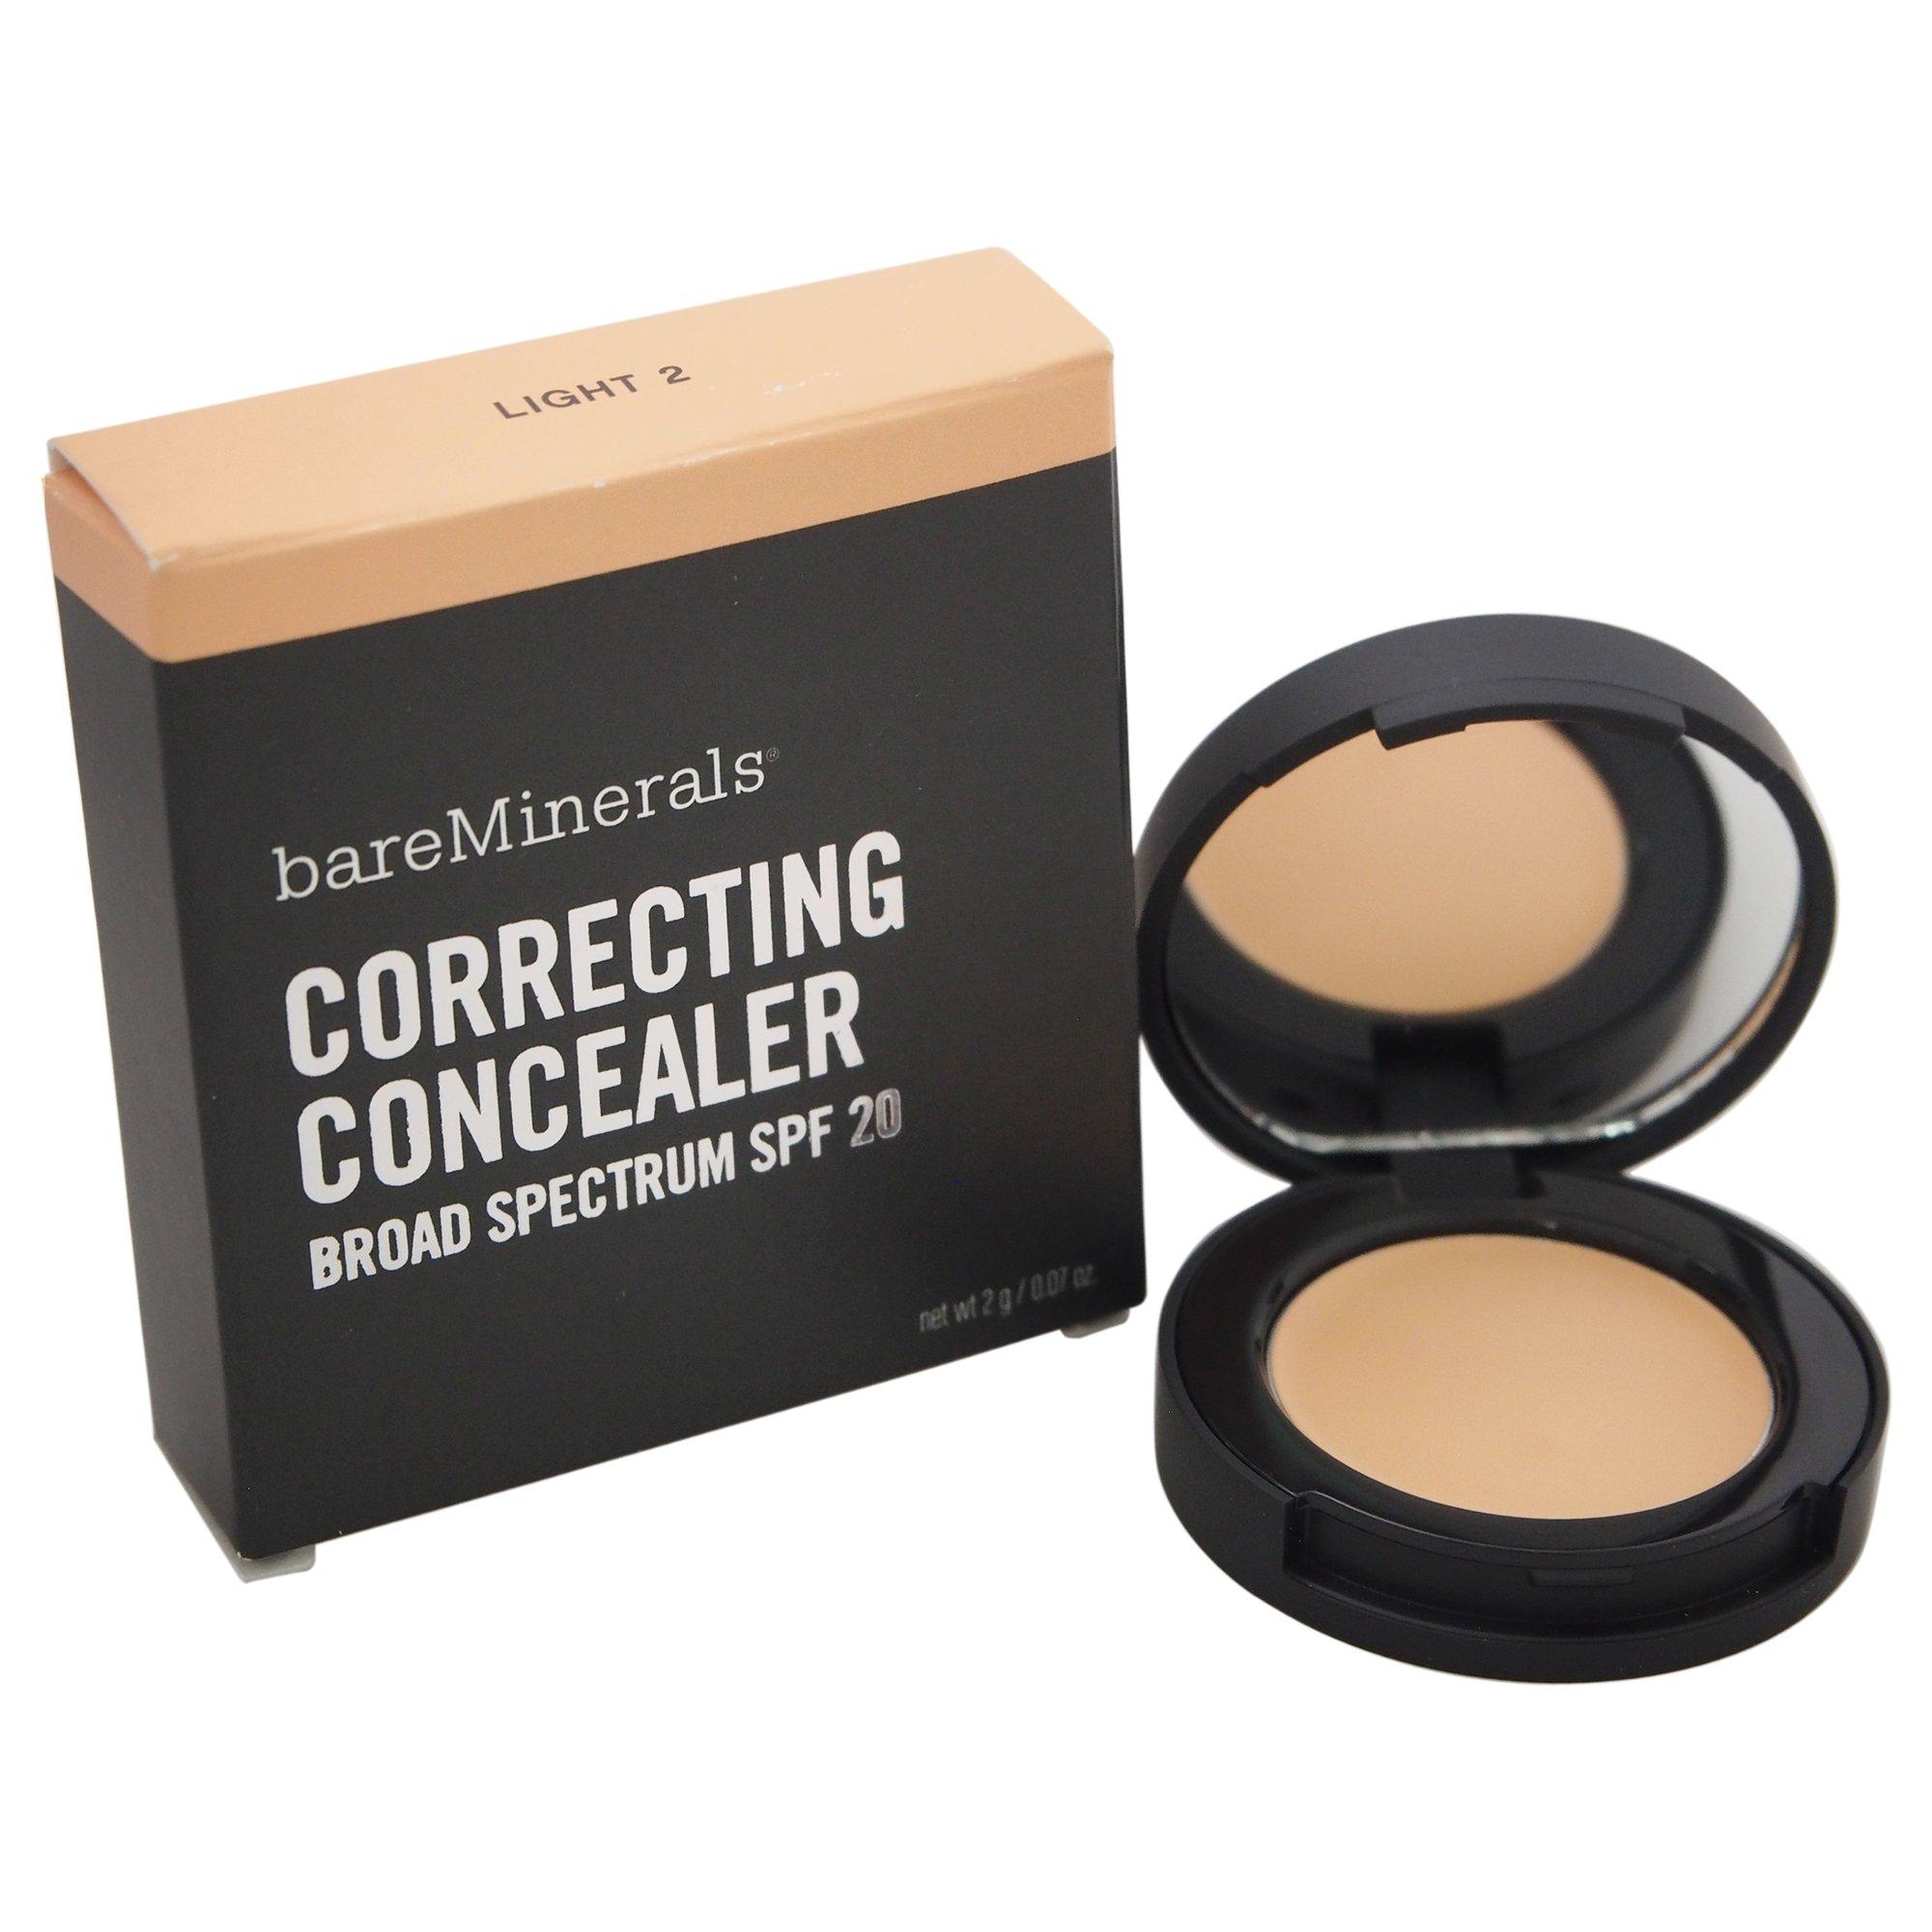 bareMinerals Creamy Correcting Concealer, Light 2 (0.07 Oz/ 2 g)